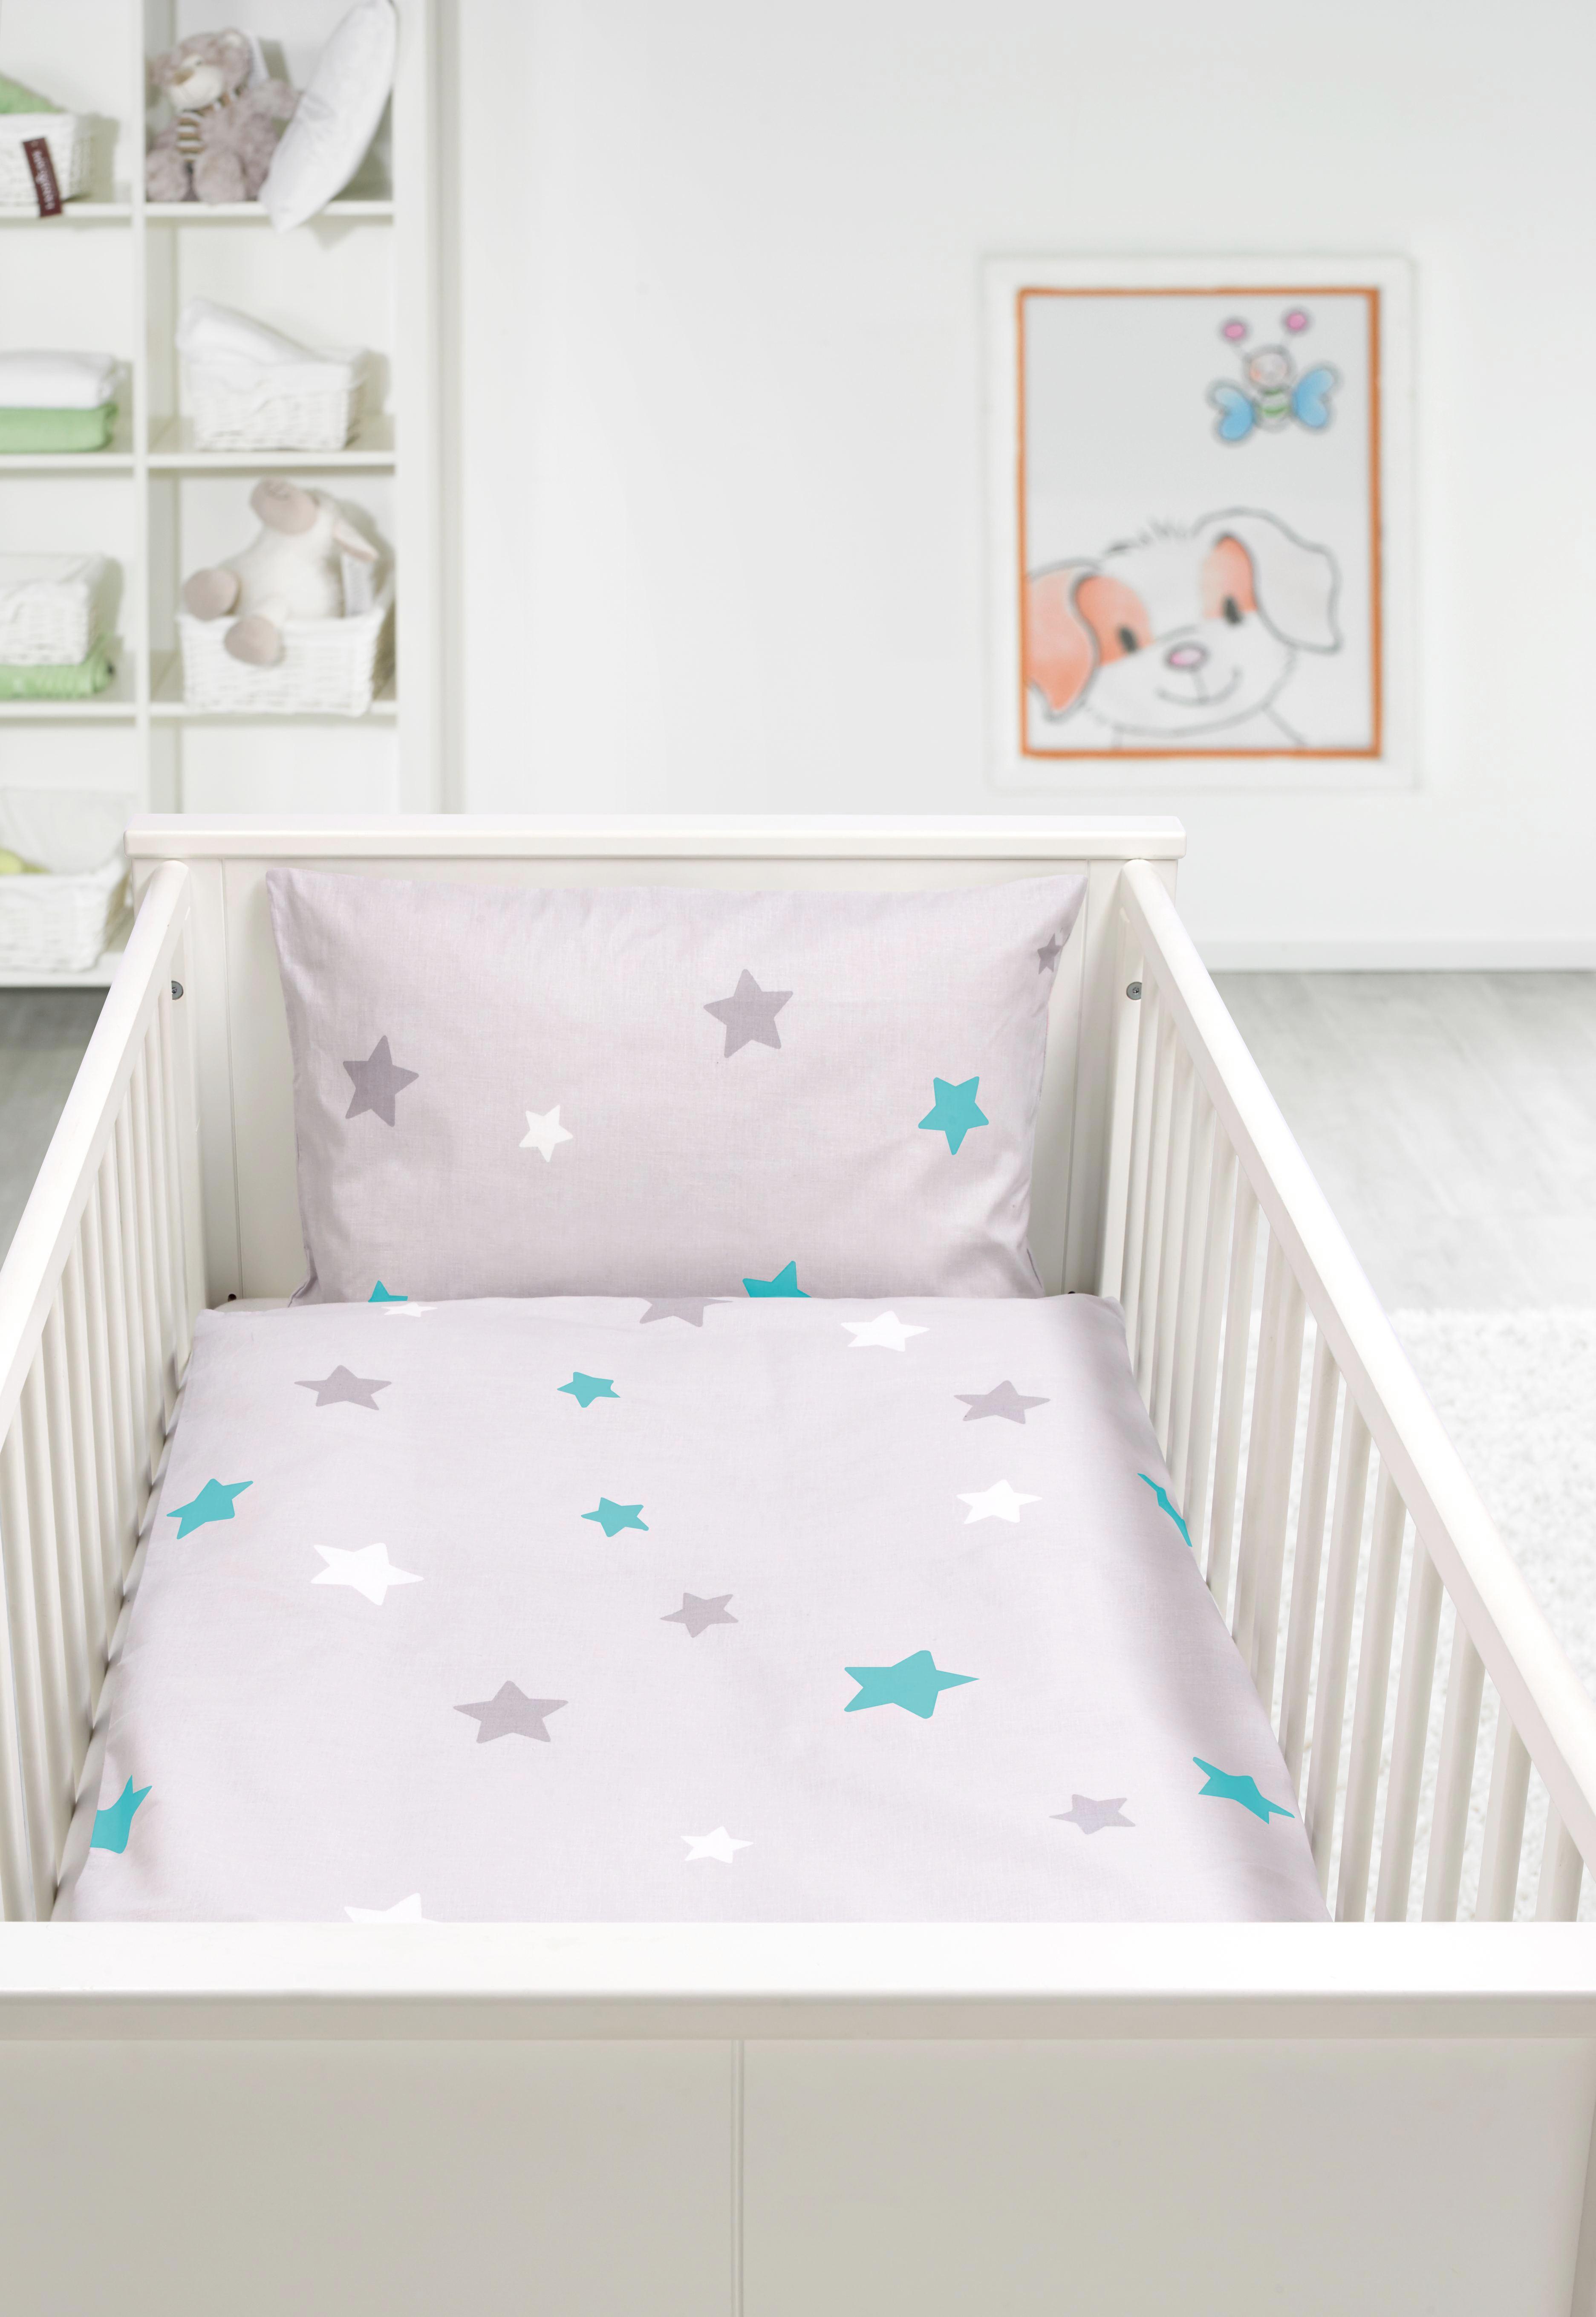 Kinderbettwäsche Scarlett ca. 100x135cm - Türkis/Grau, Textil - MÖMAX modern living